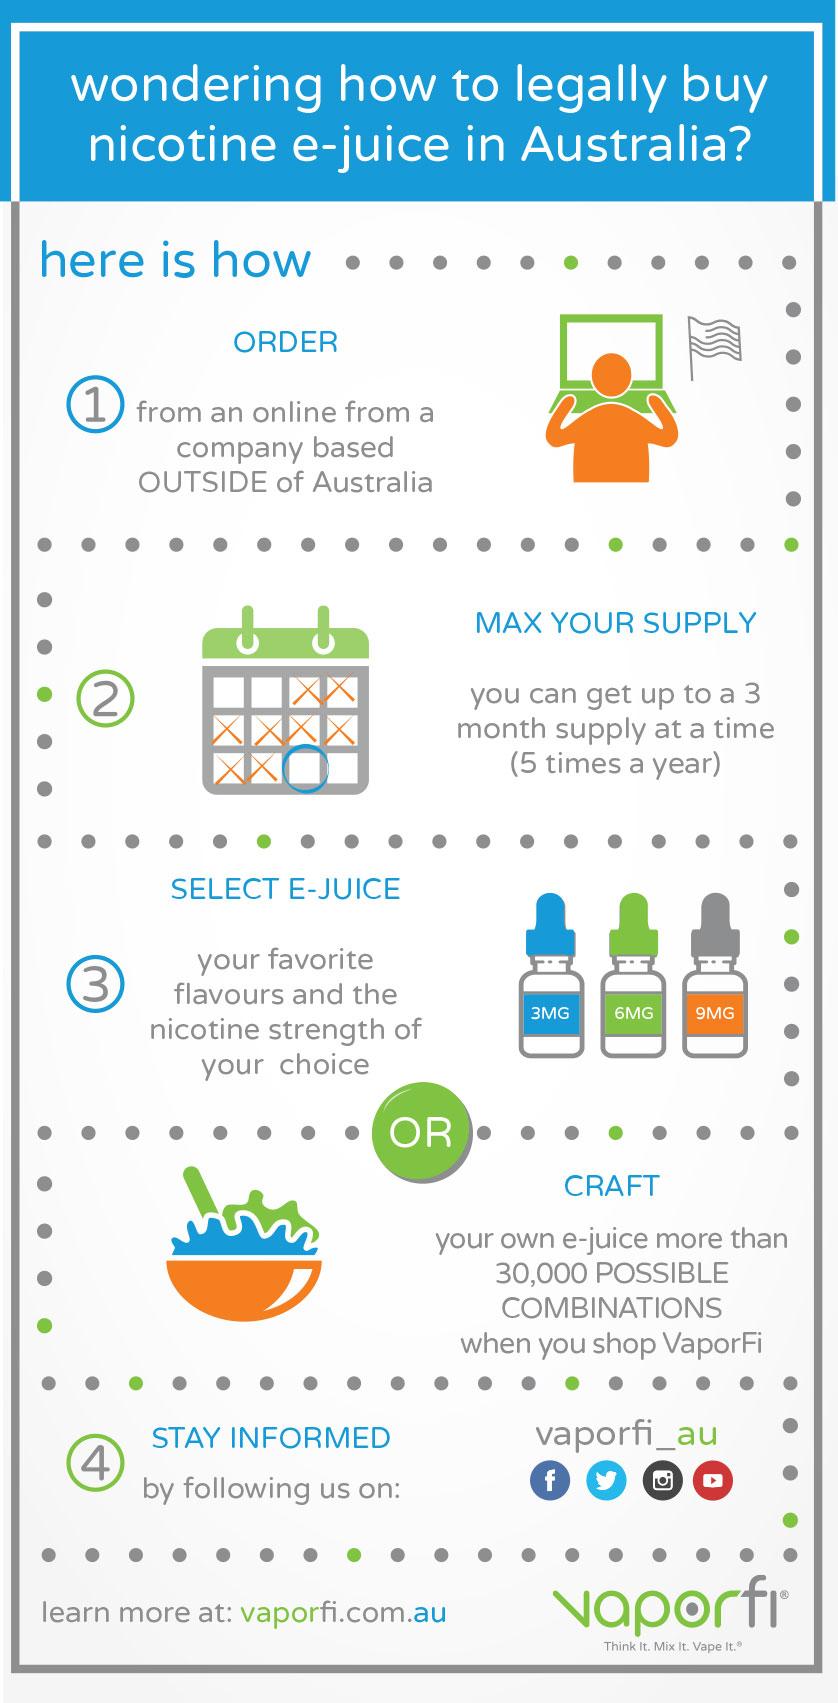 VaporFi Australia - Understanding Australia's Vaping Law - Infographic